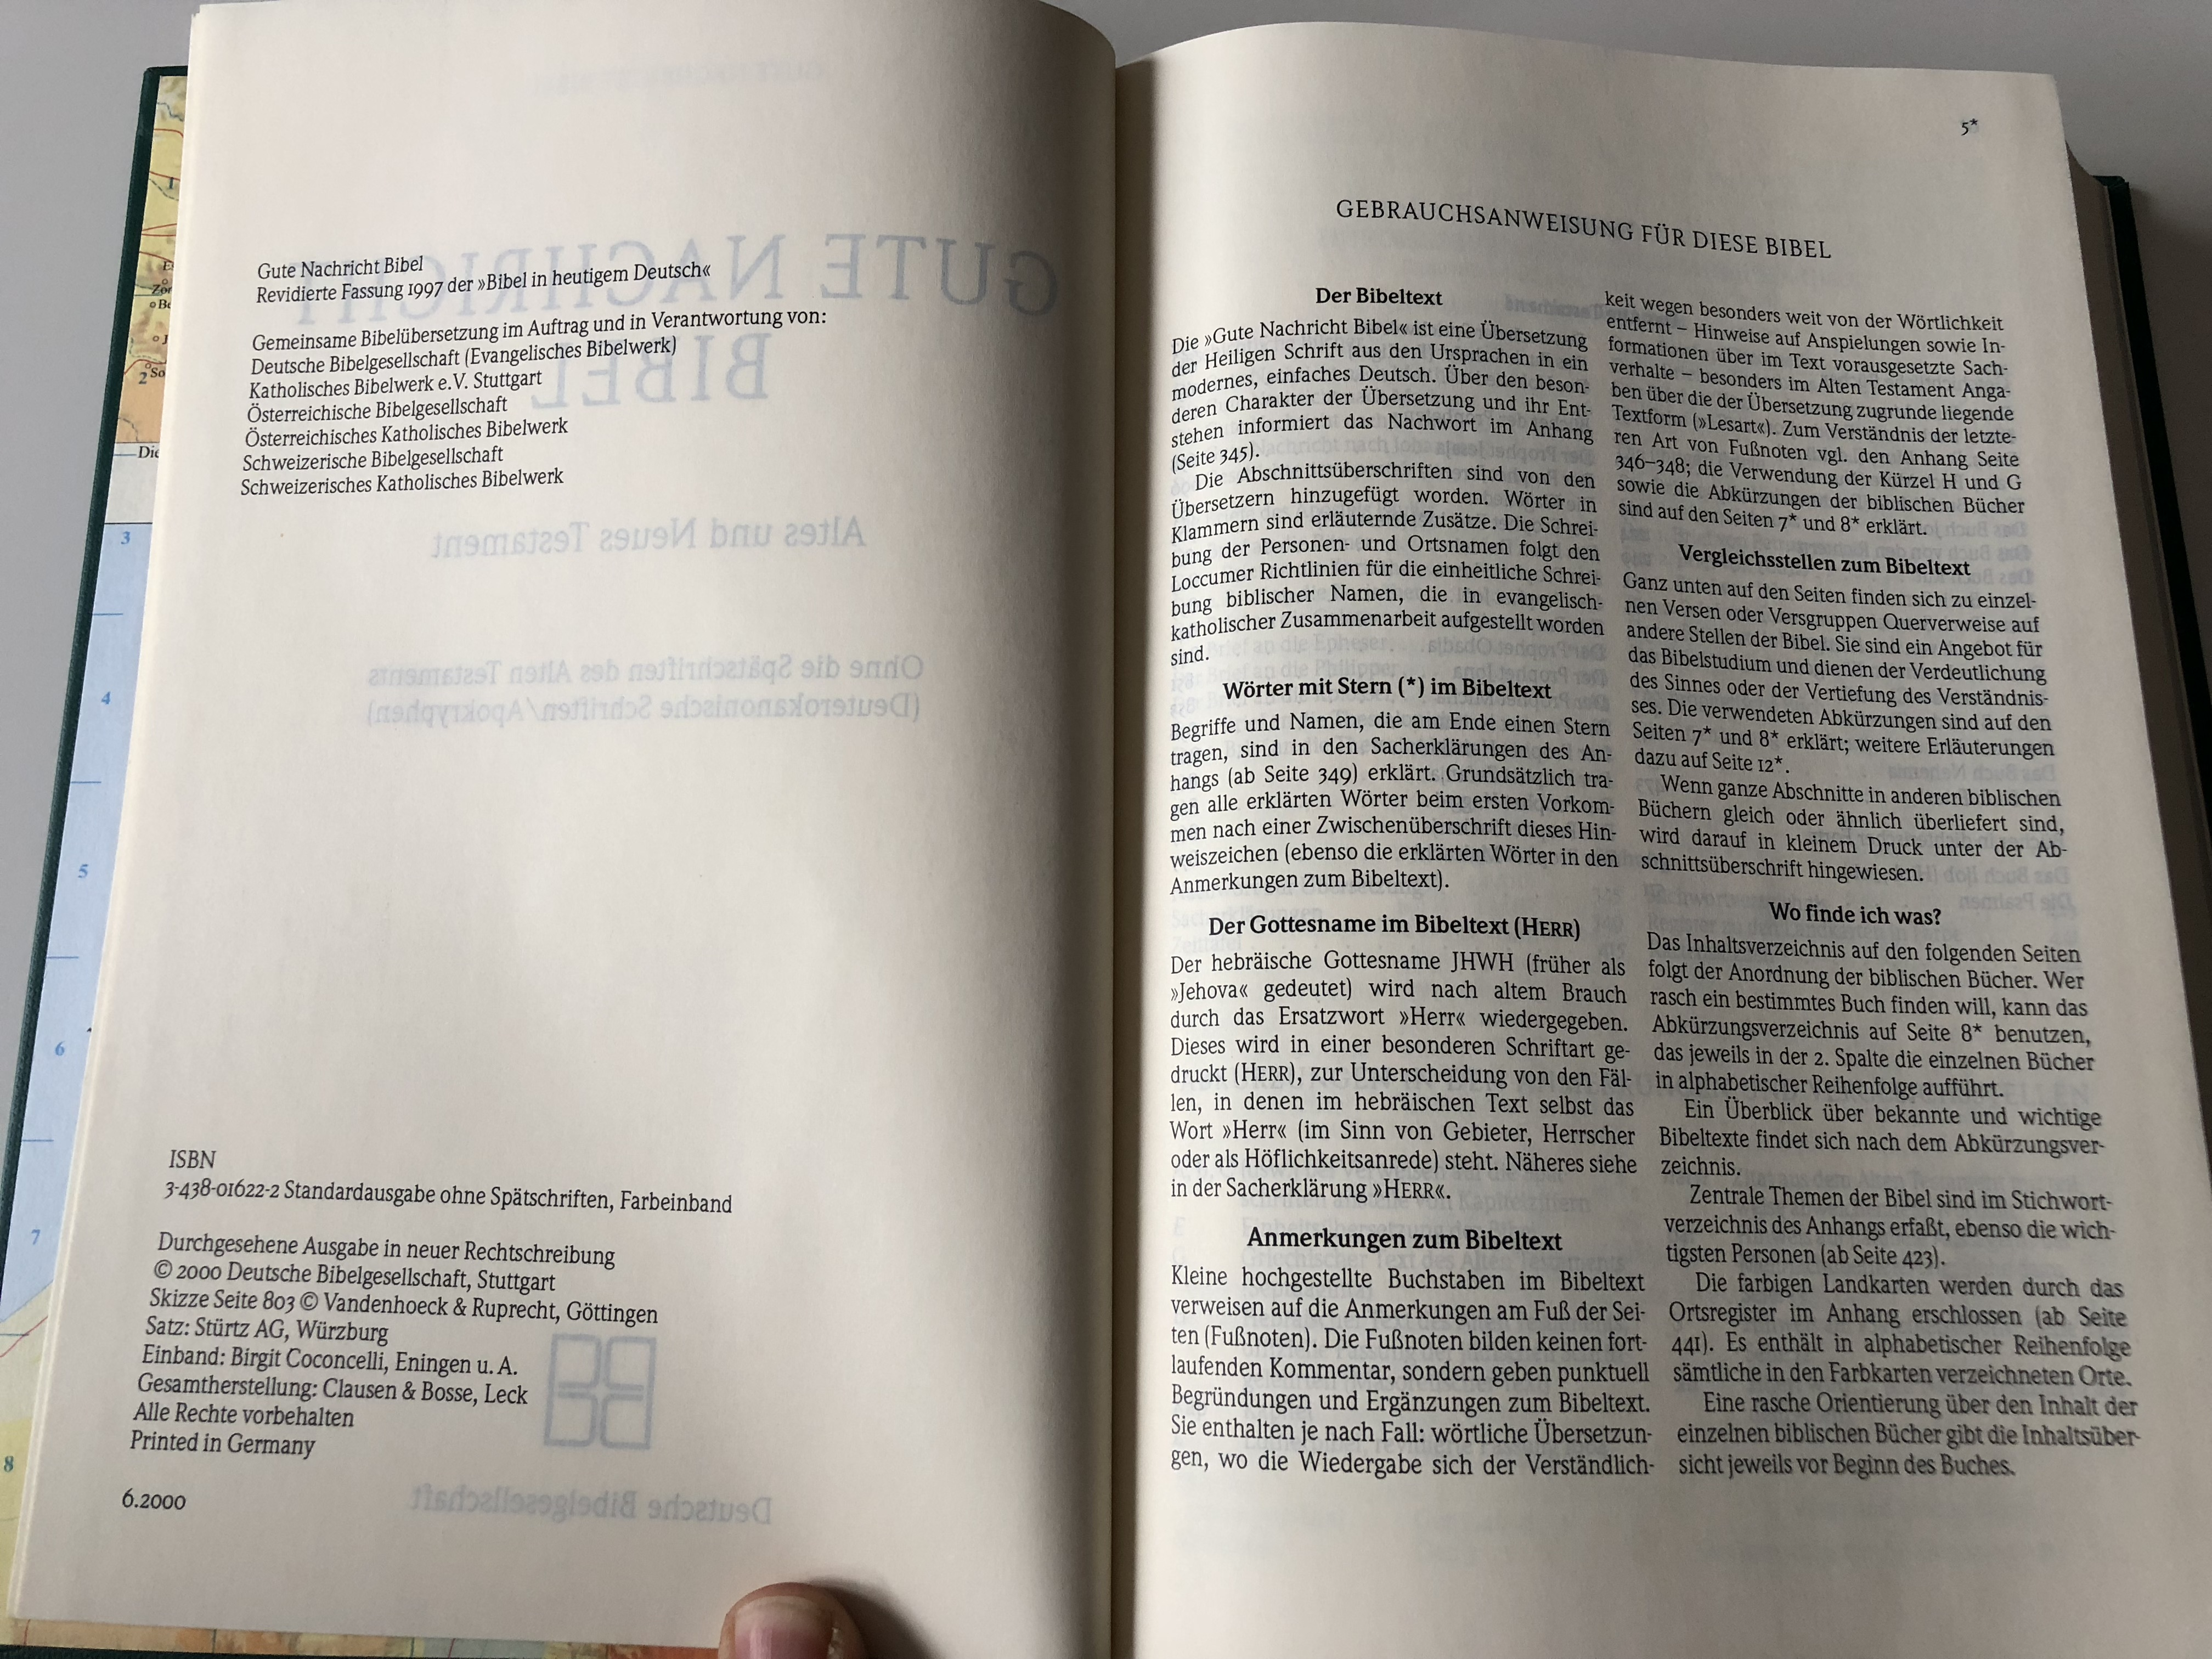 gute-nachricht-bibel-today-s-german-holy-bible-6-.jpg